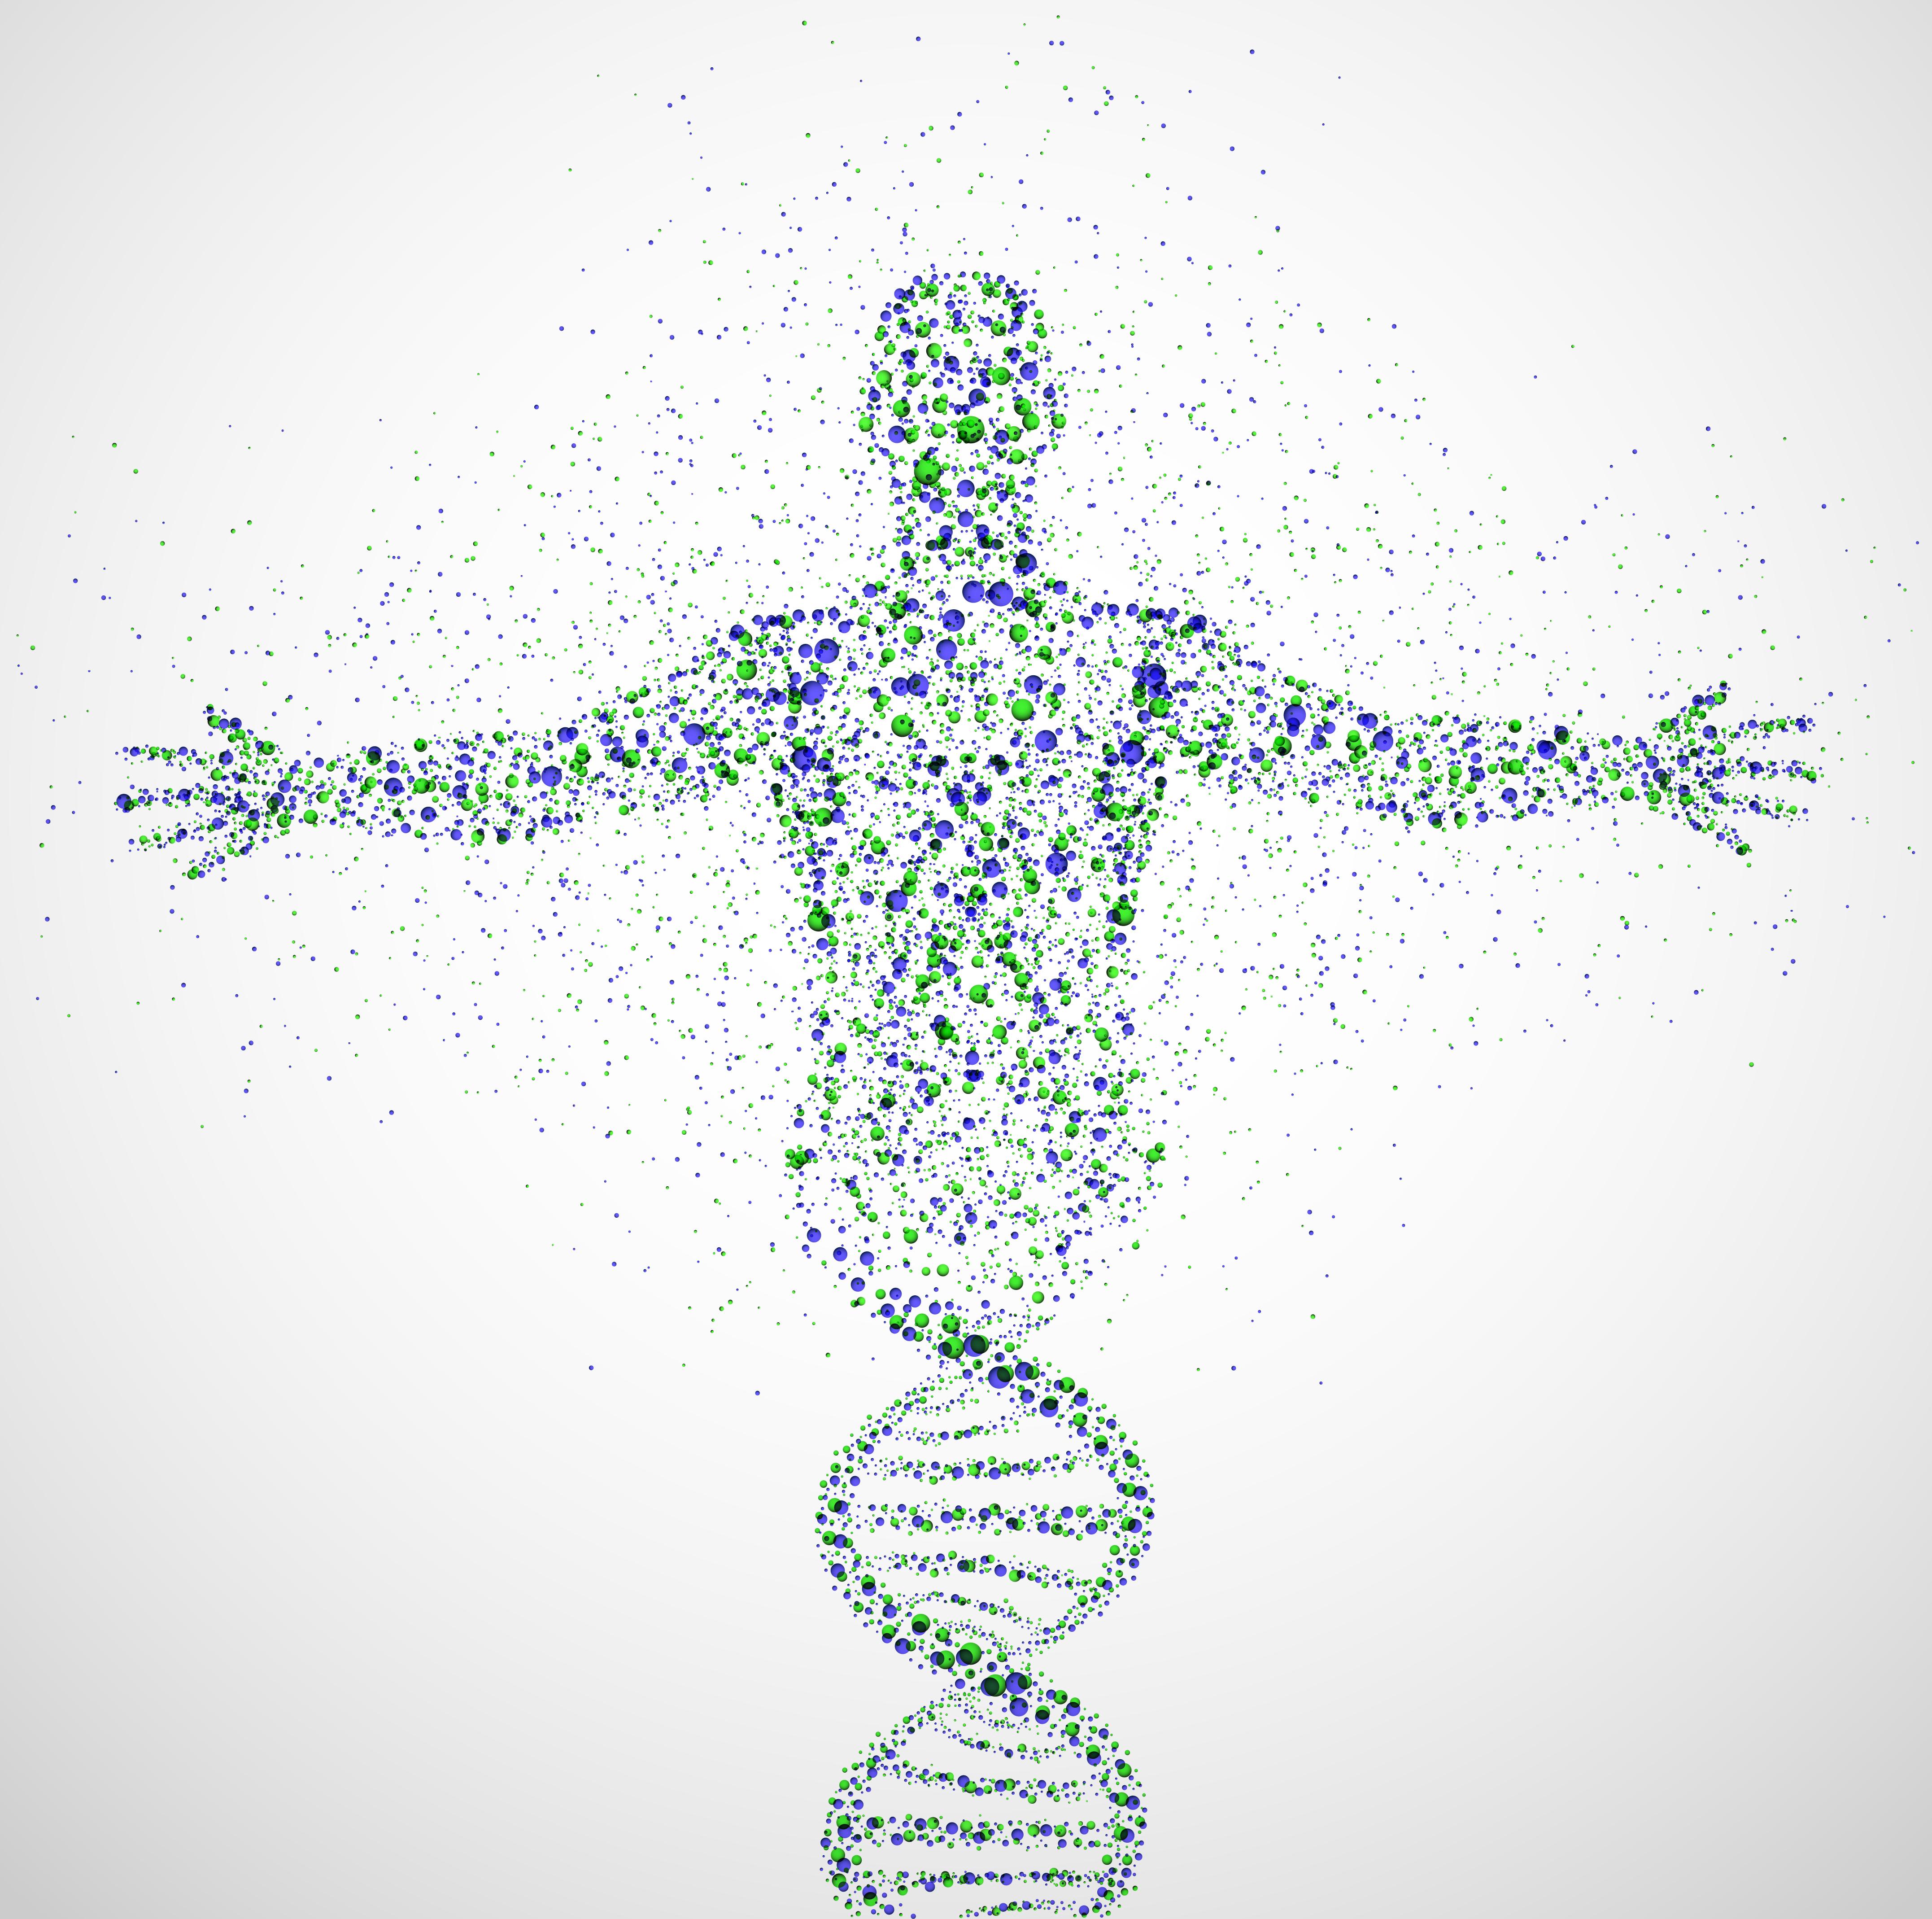 medihelden - Praxismanagement - Mann aus DNS DNA